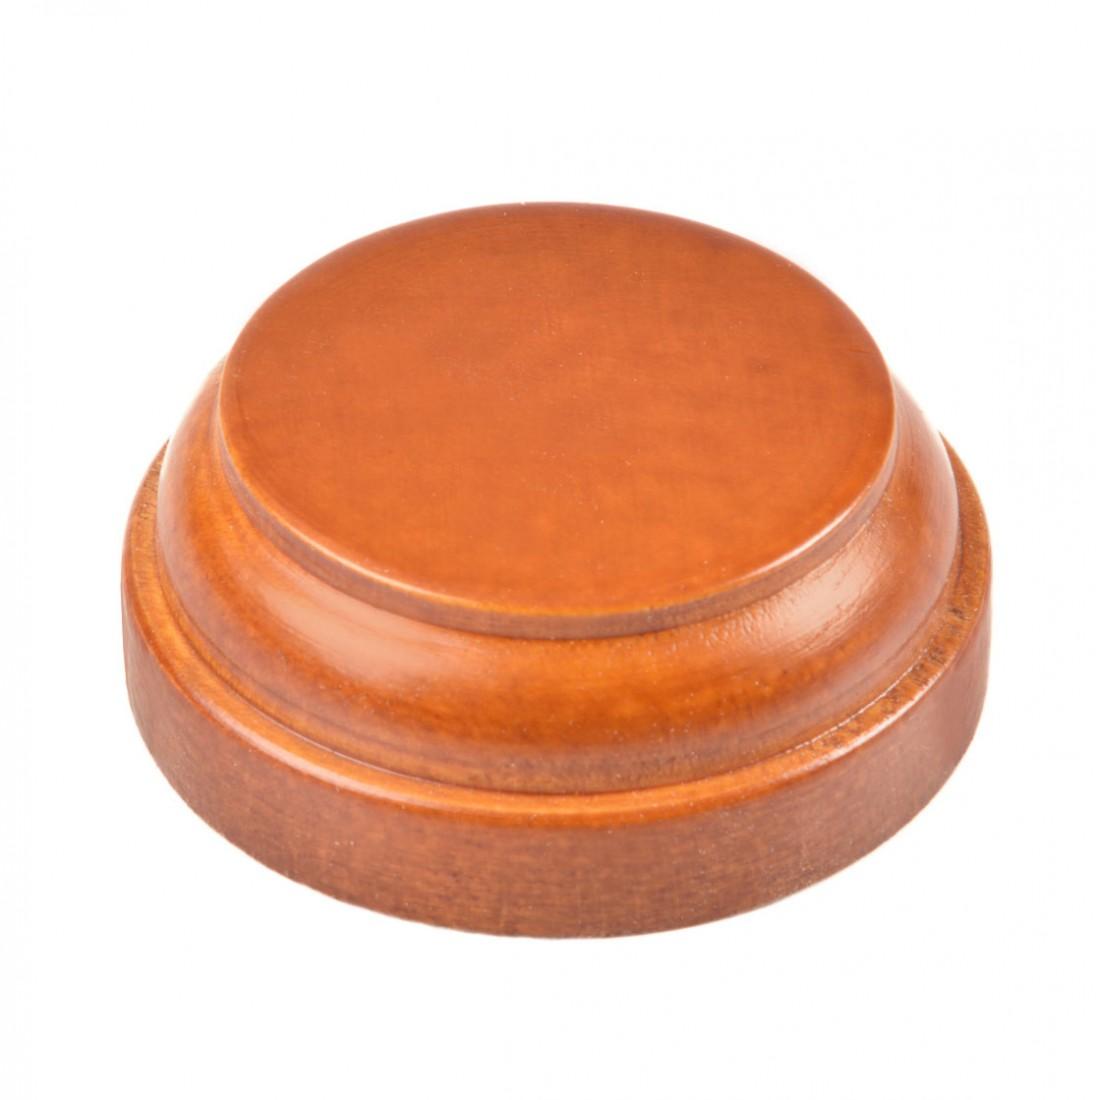 Base redonda de madera mm.50 barnizada.